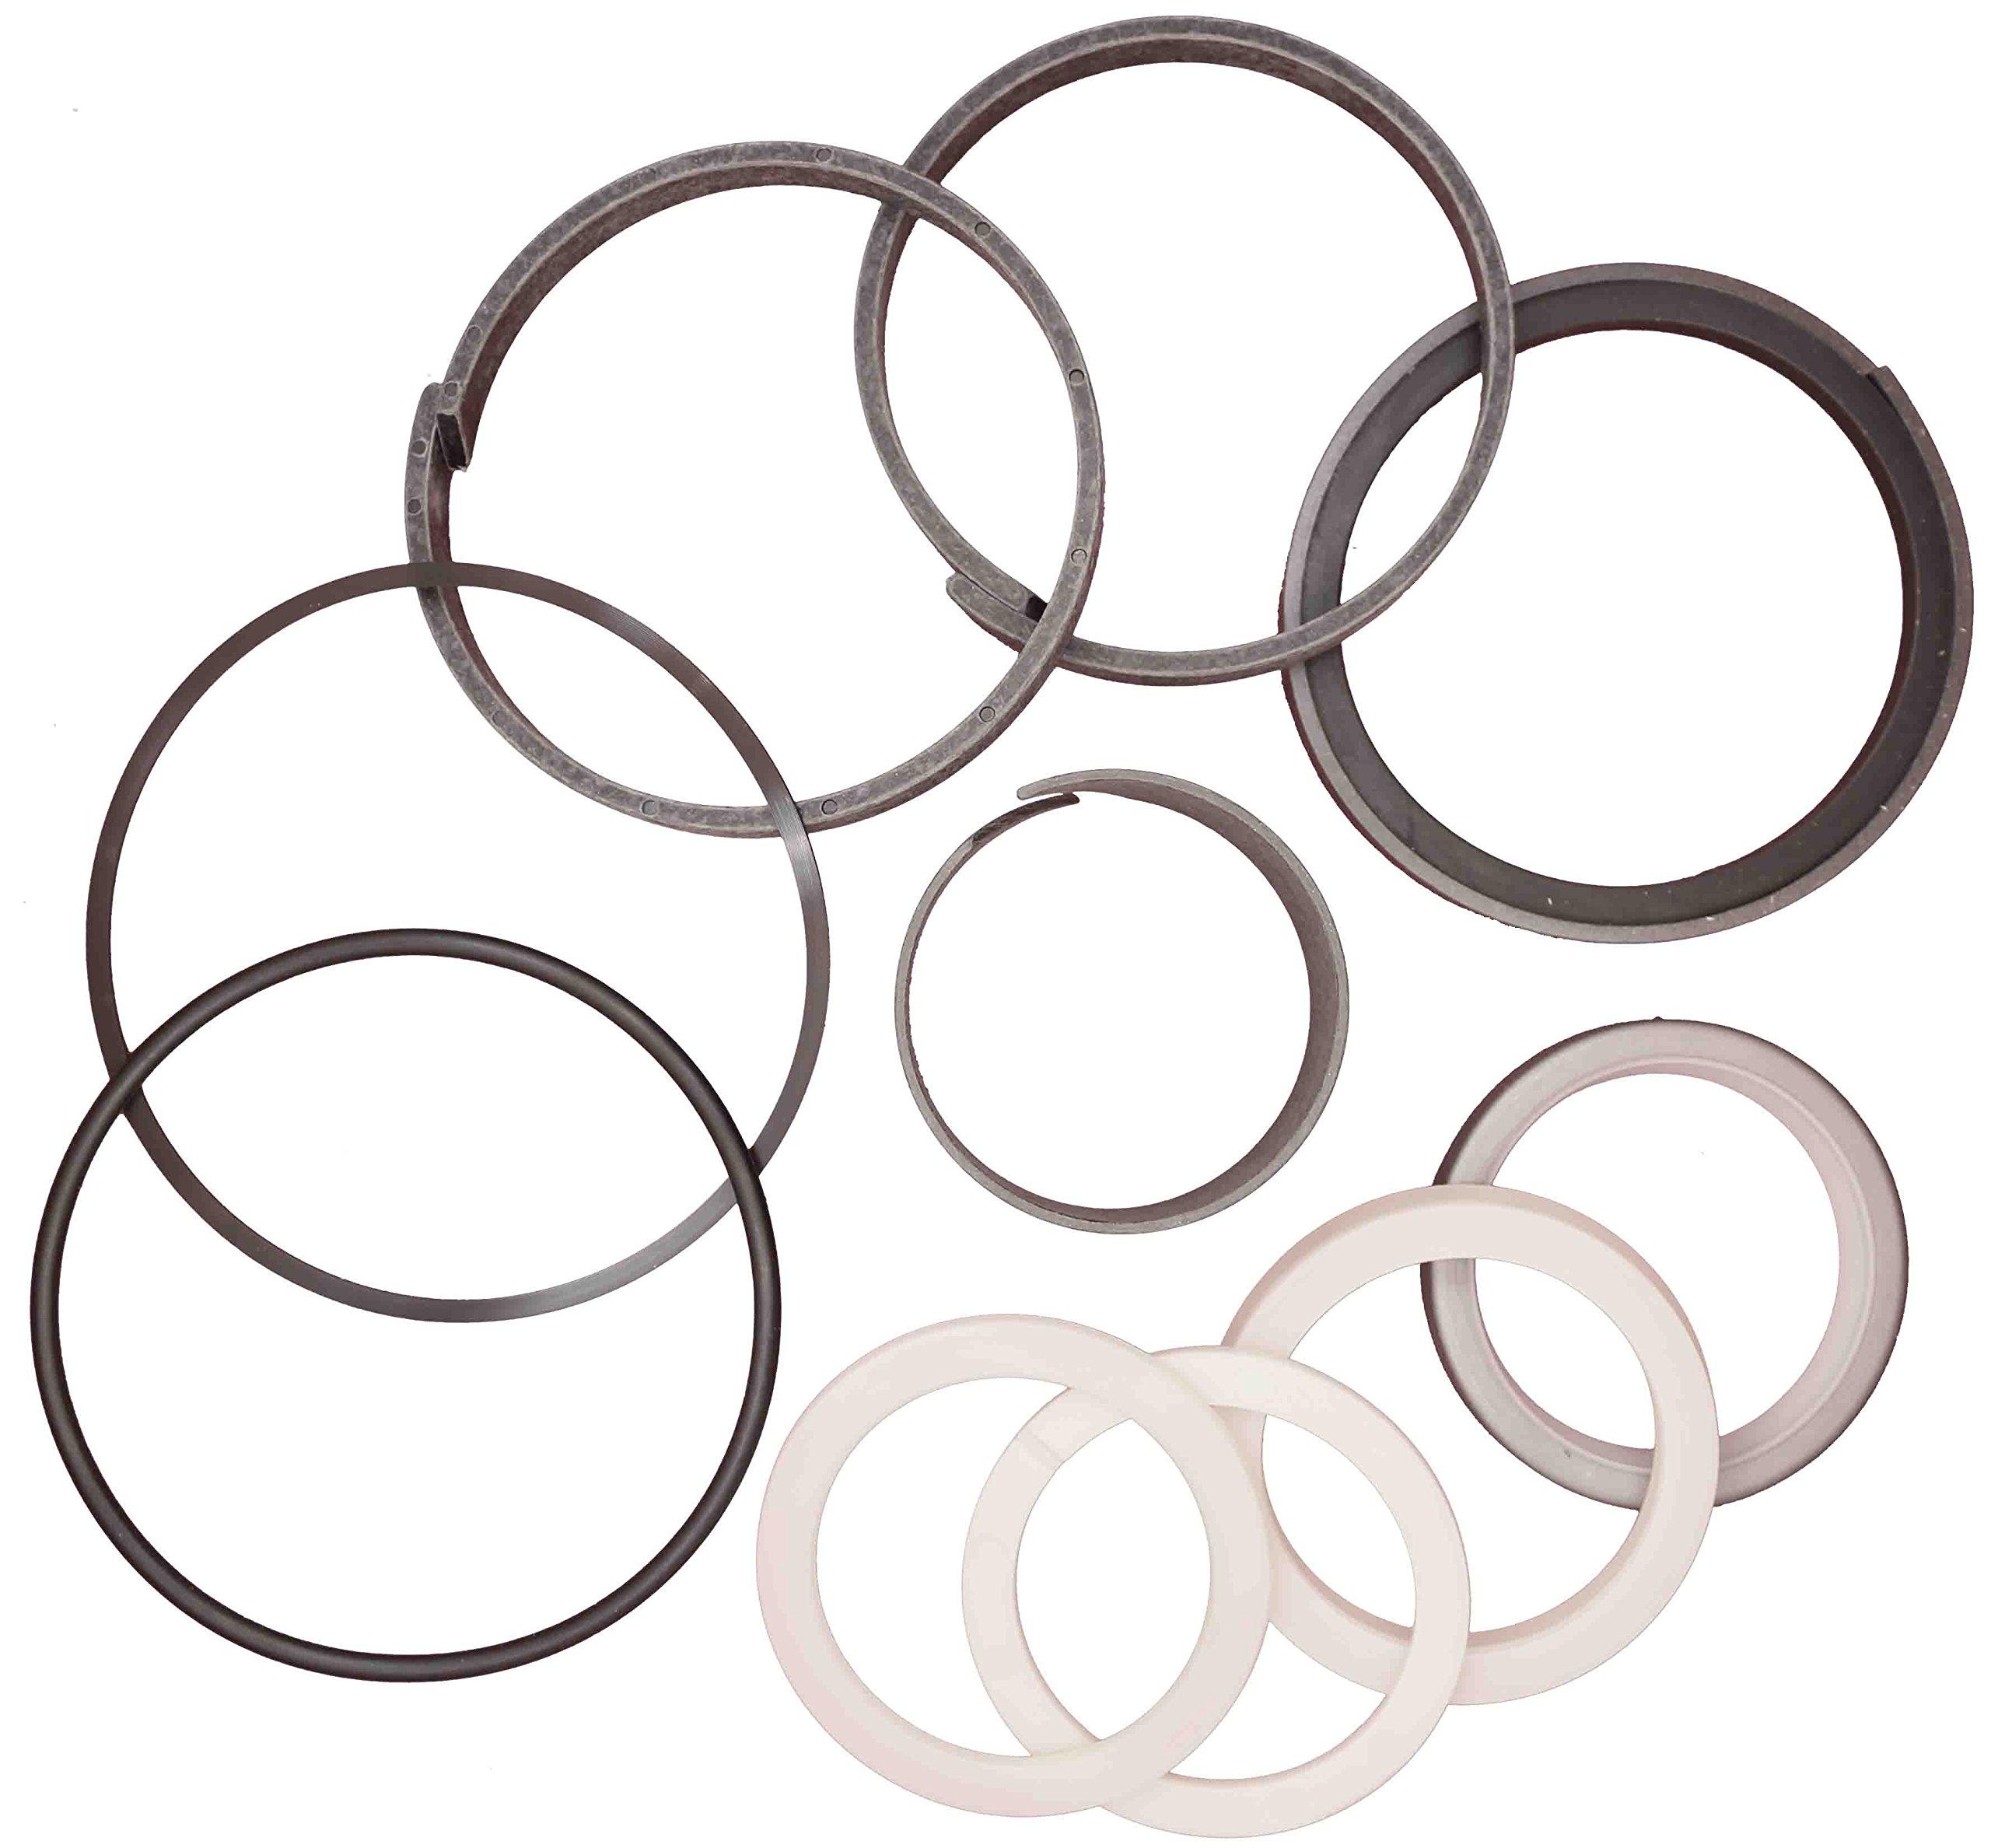 TORNADO HEAVY EQUIPMENT PARTS 1543274C1 Case G109453 Hydraulic Cylinder Seal Kit